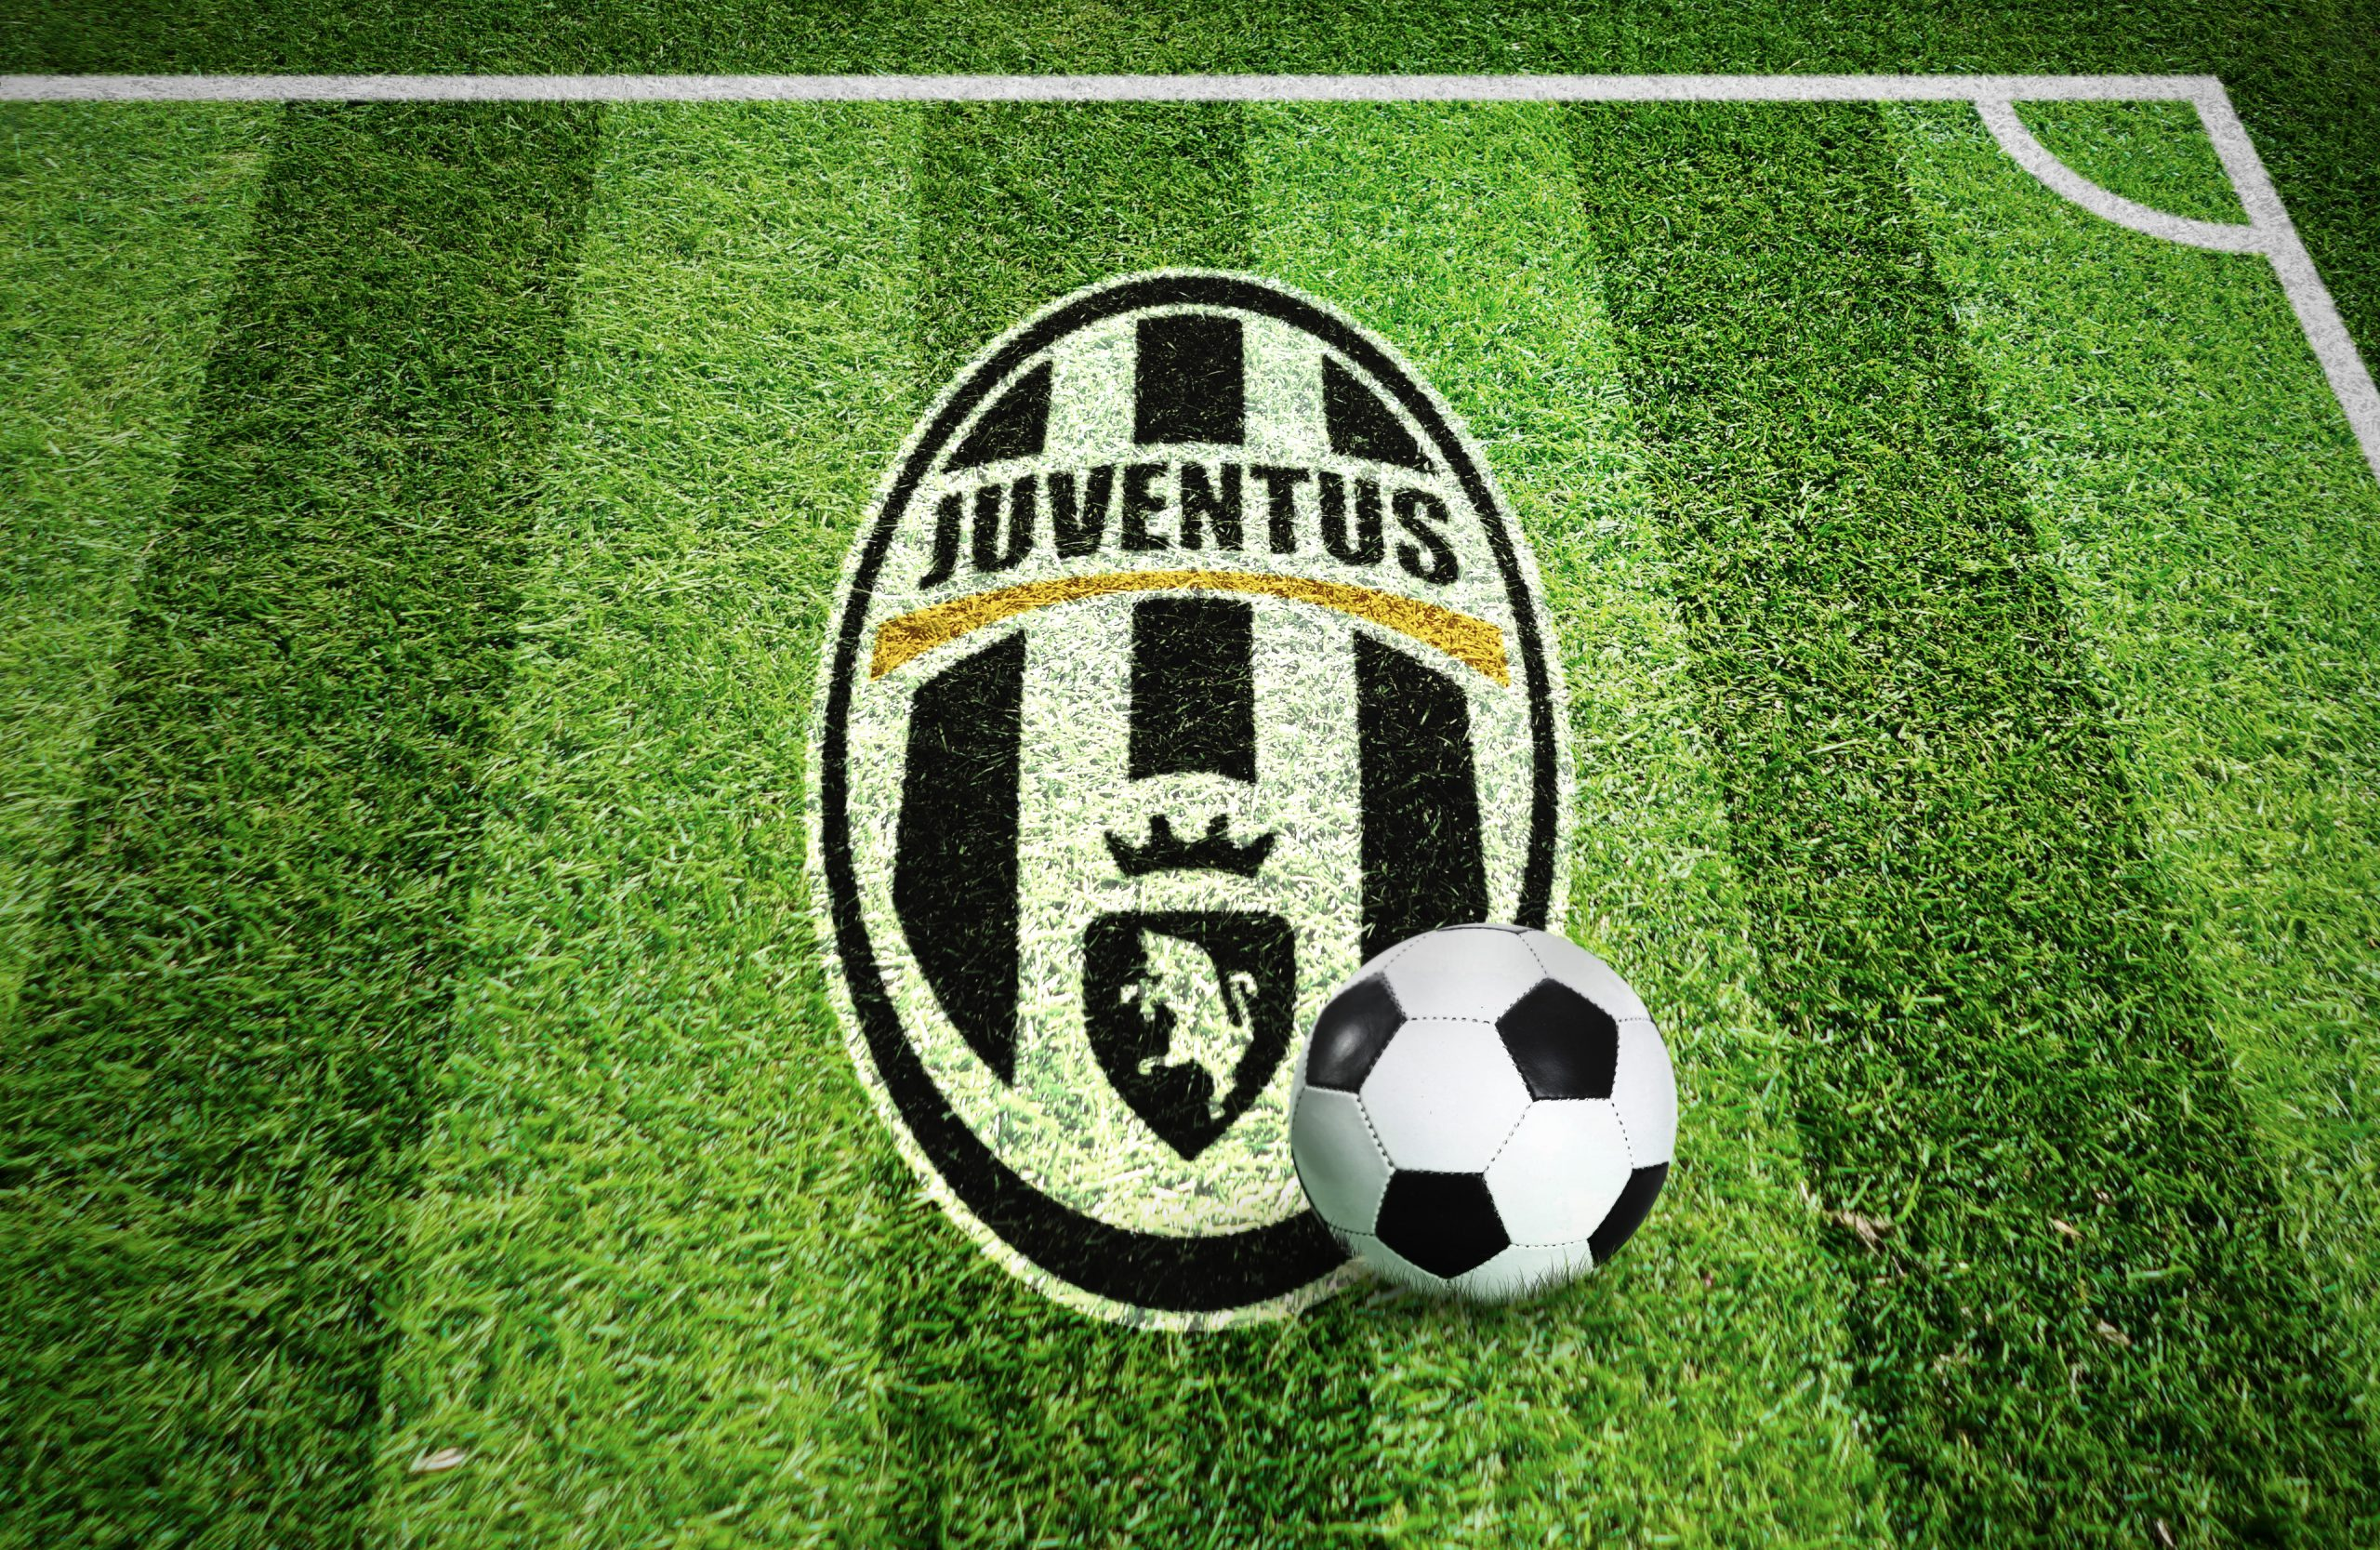 Juventus Stadium Grass Ground Logo Mockup